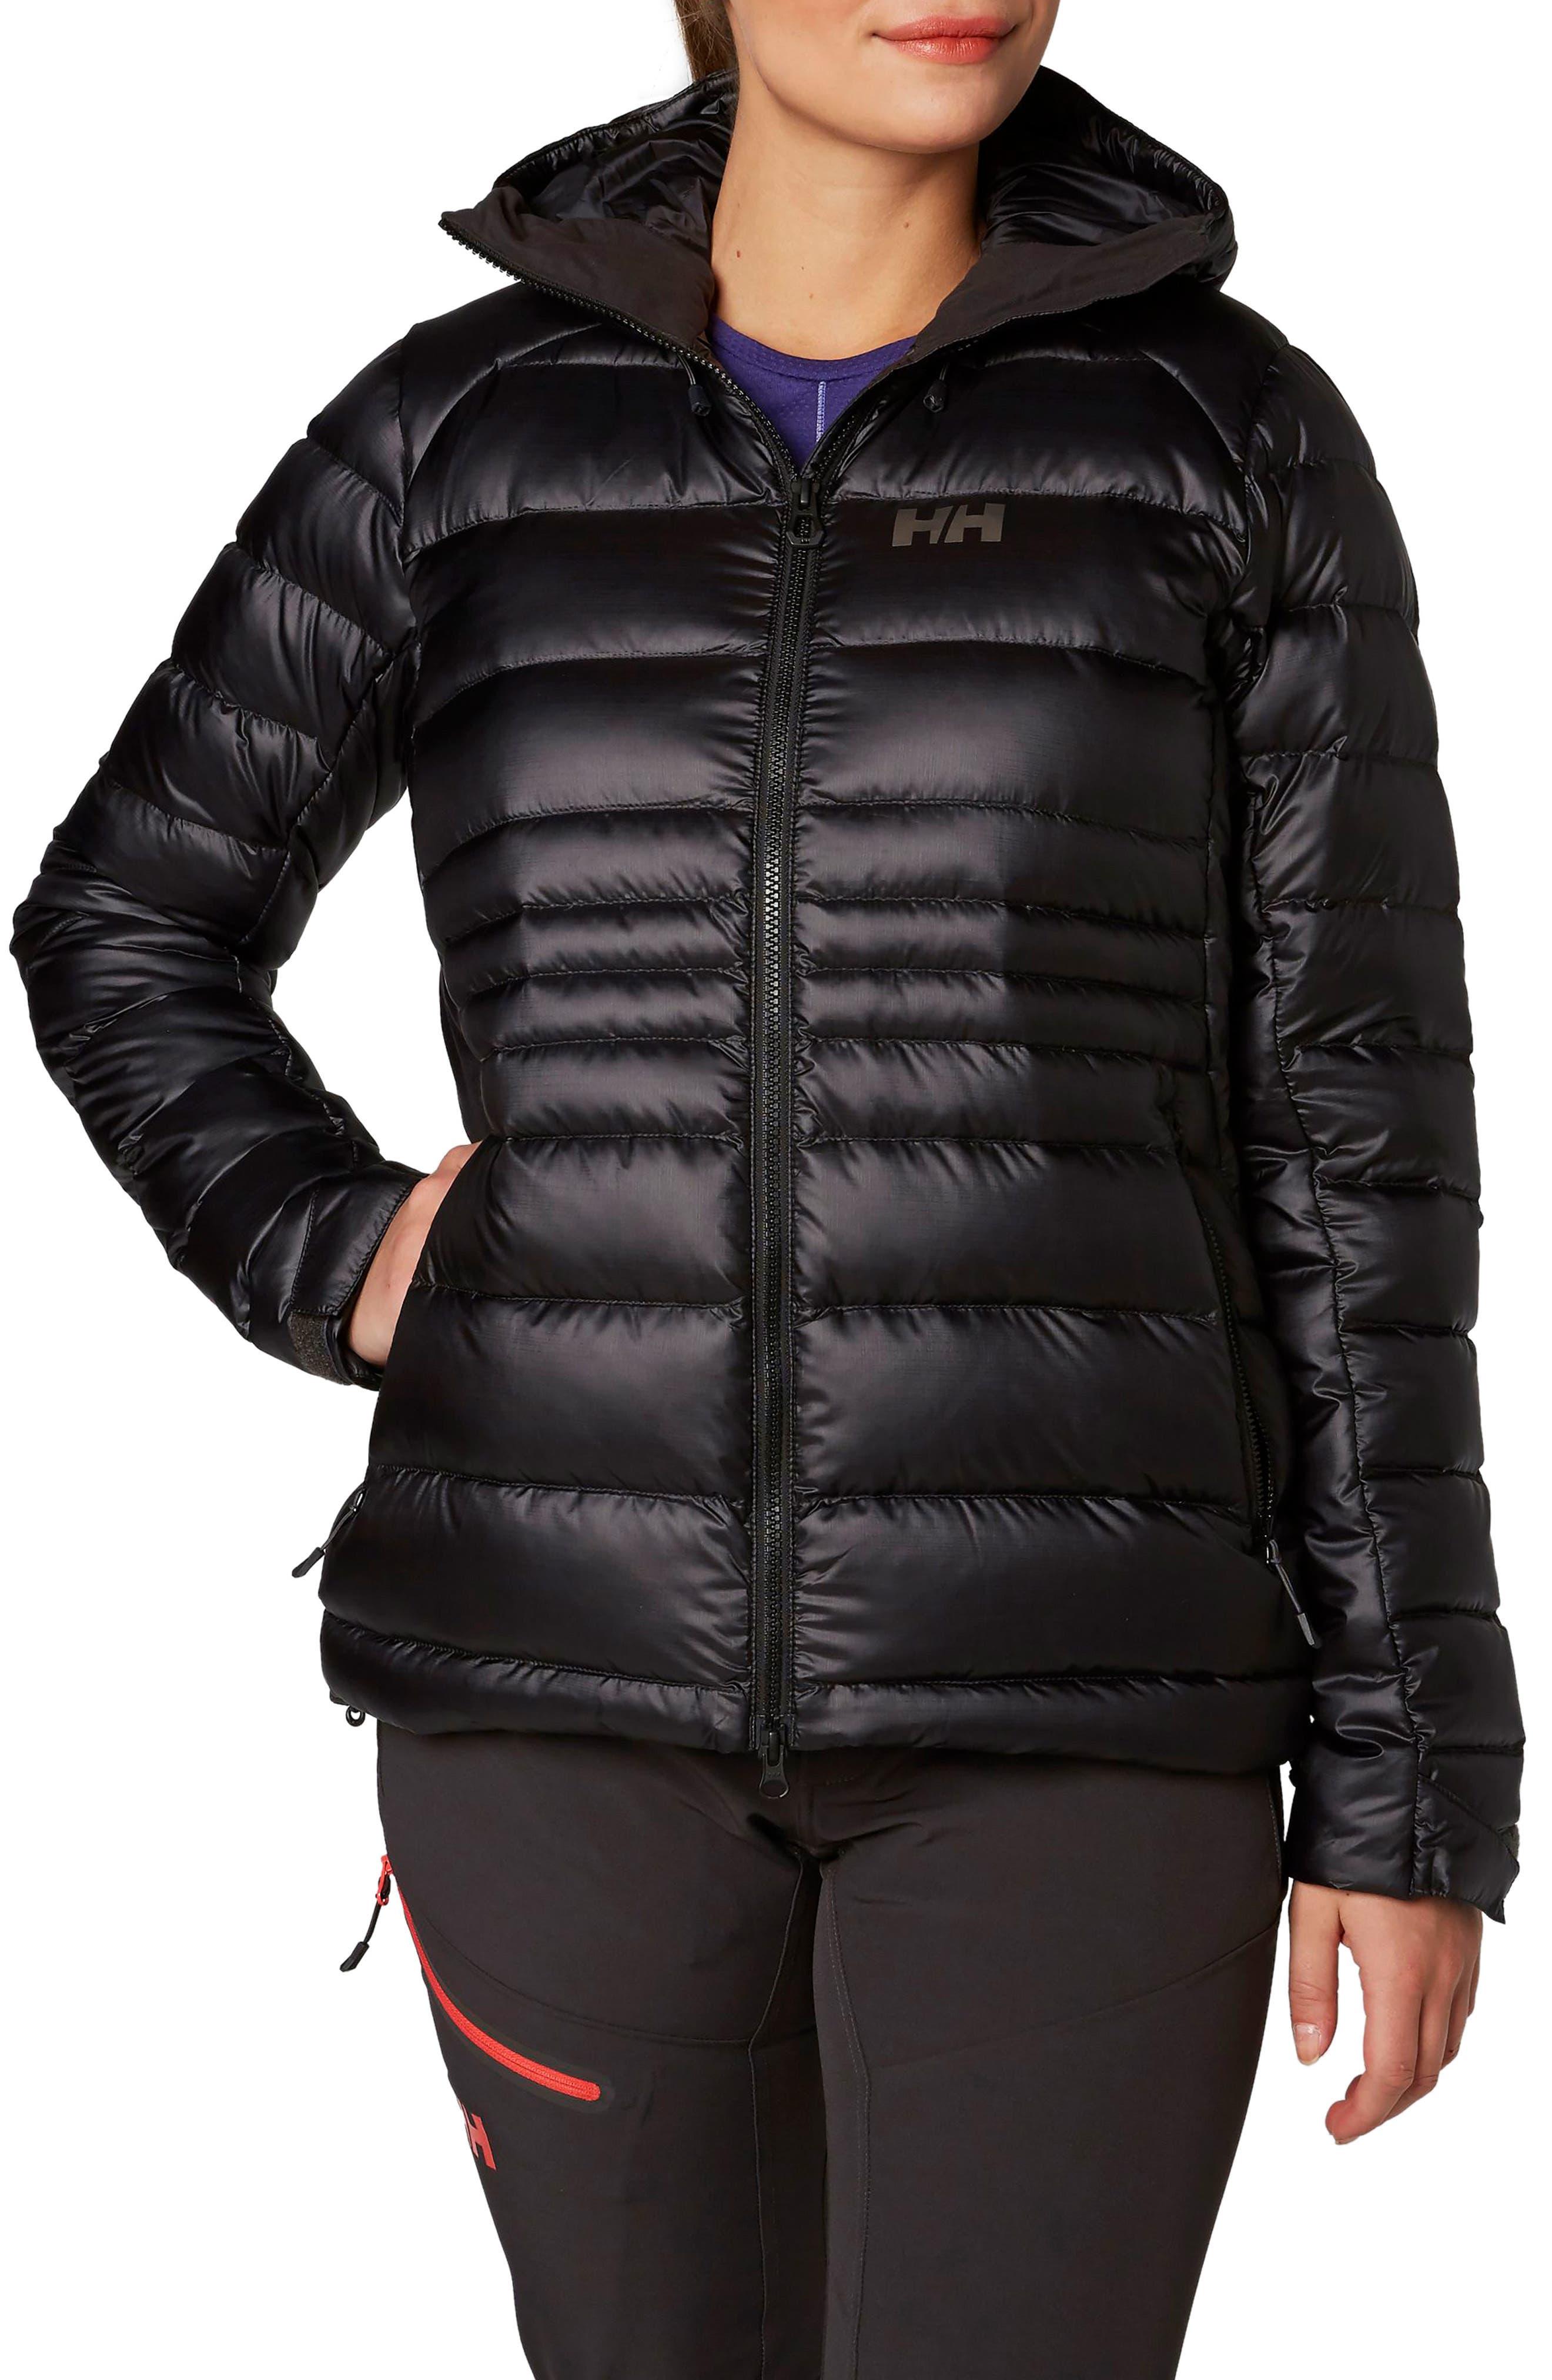 Vanir Icefall Down Jacket,                         Main,                         color, 001